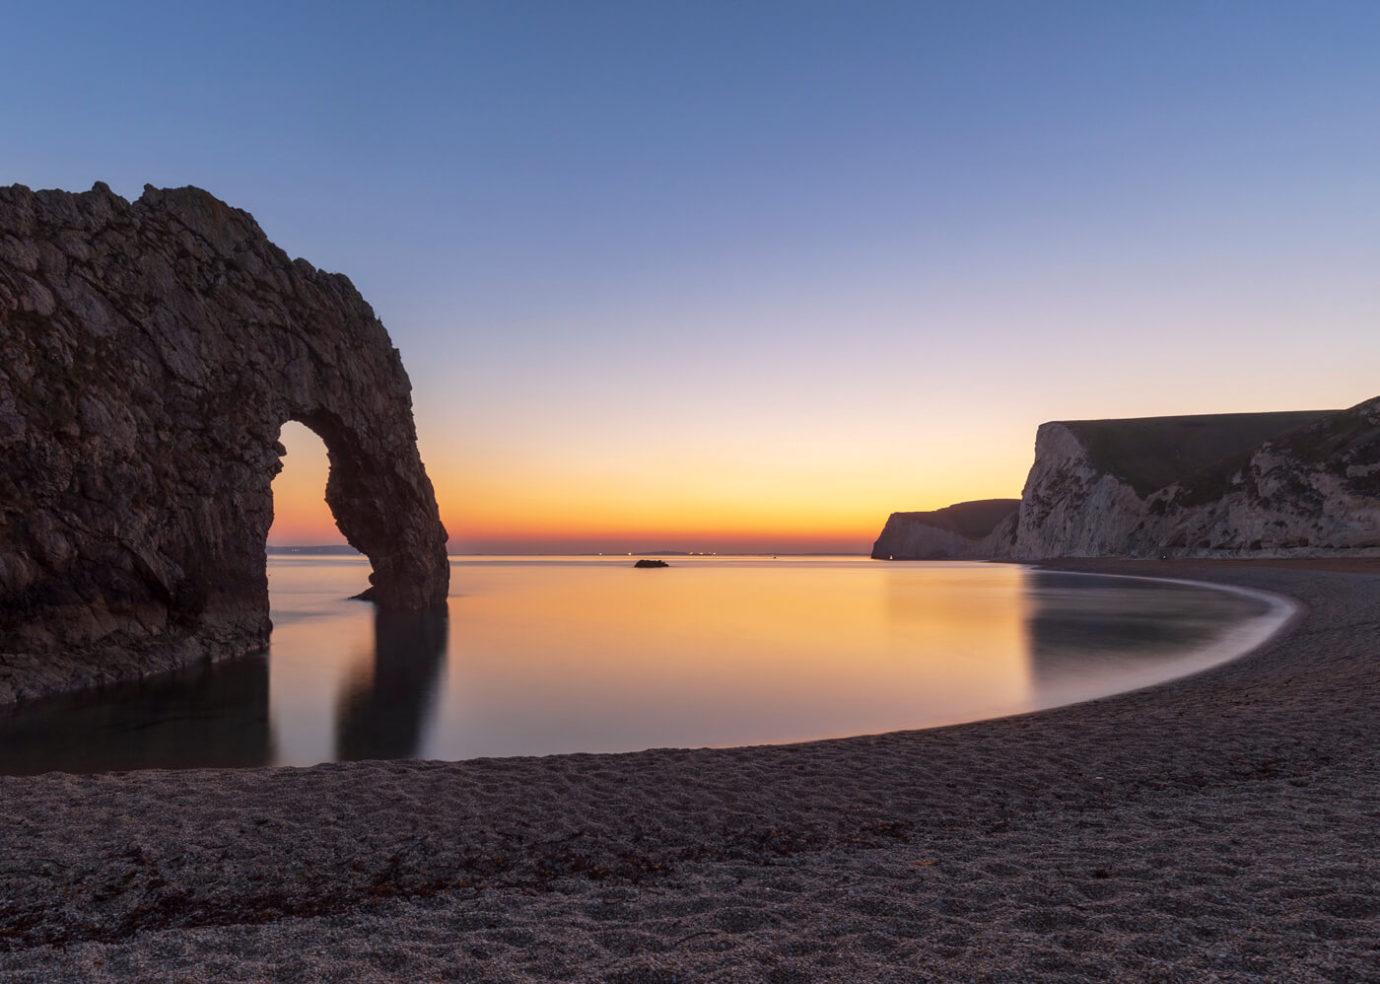 Sunset, Durdle Door, Dorset